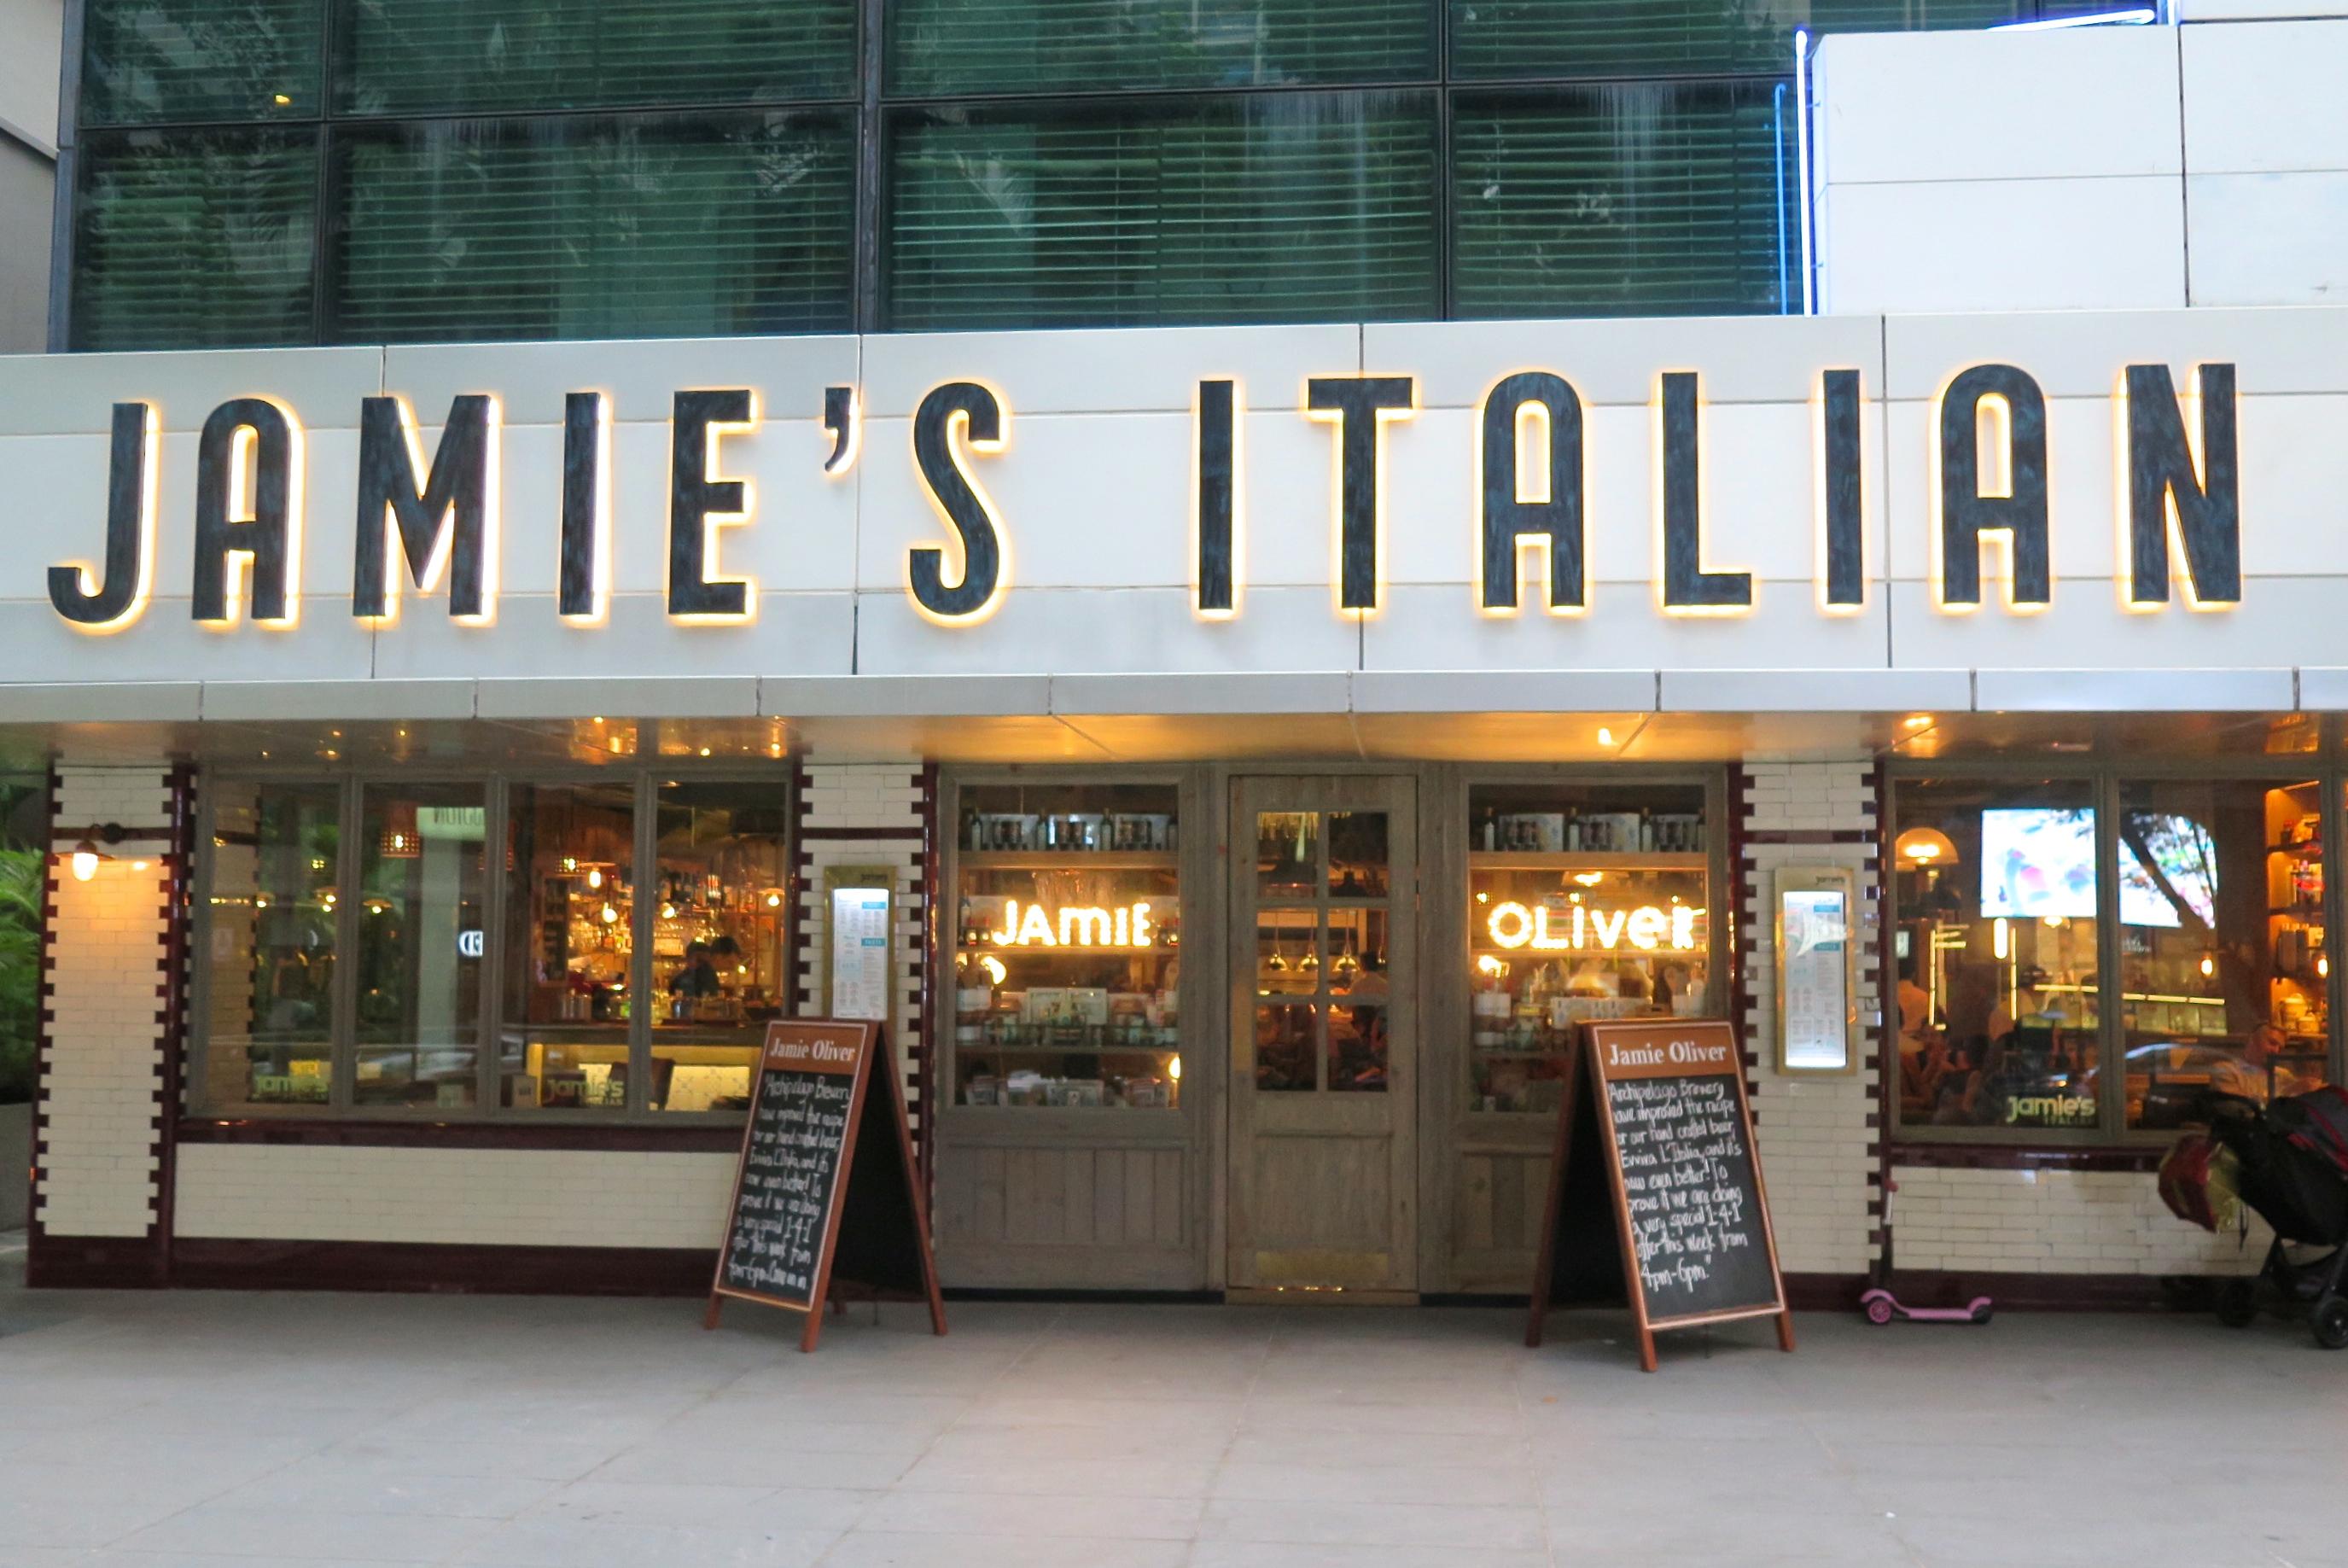 Create An Unforgettable Restaurant Name